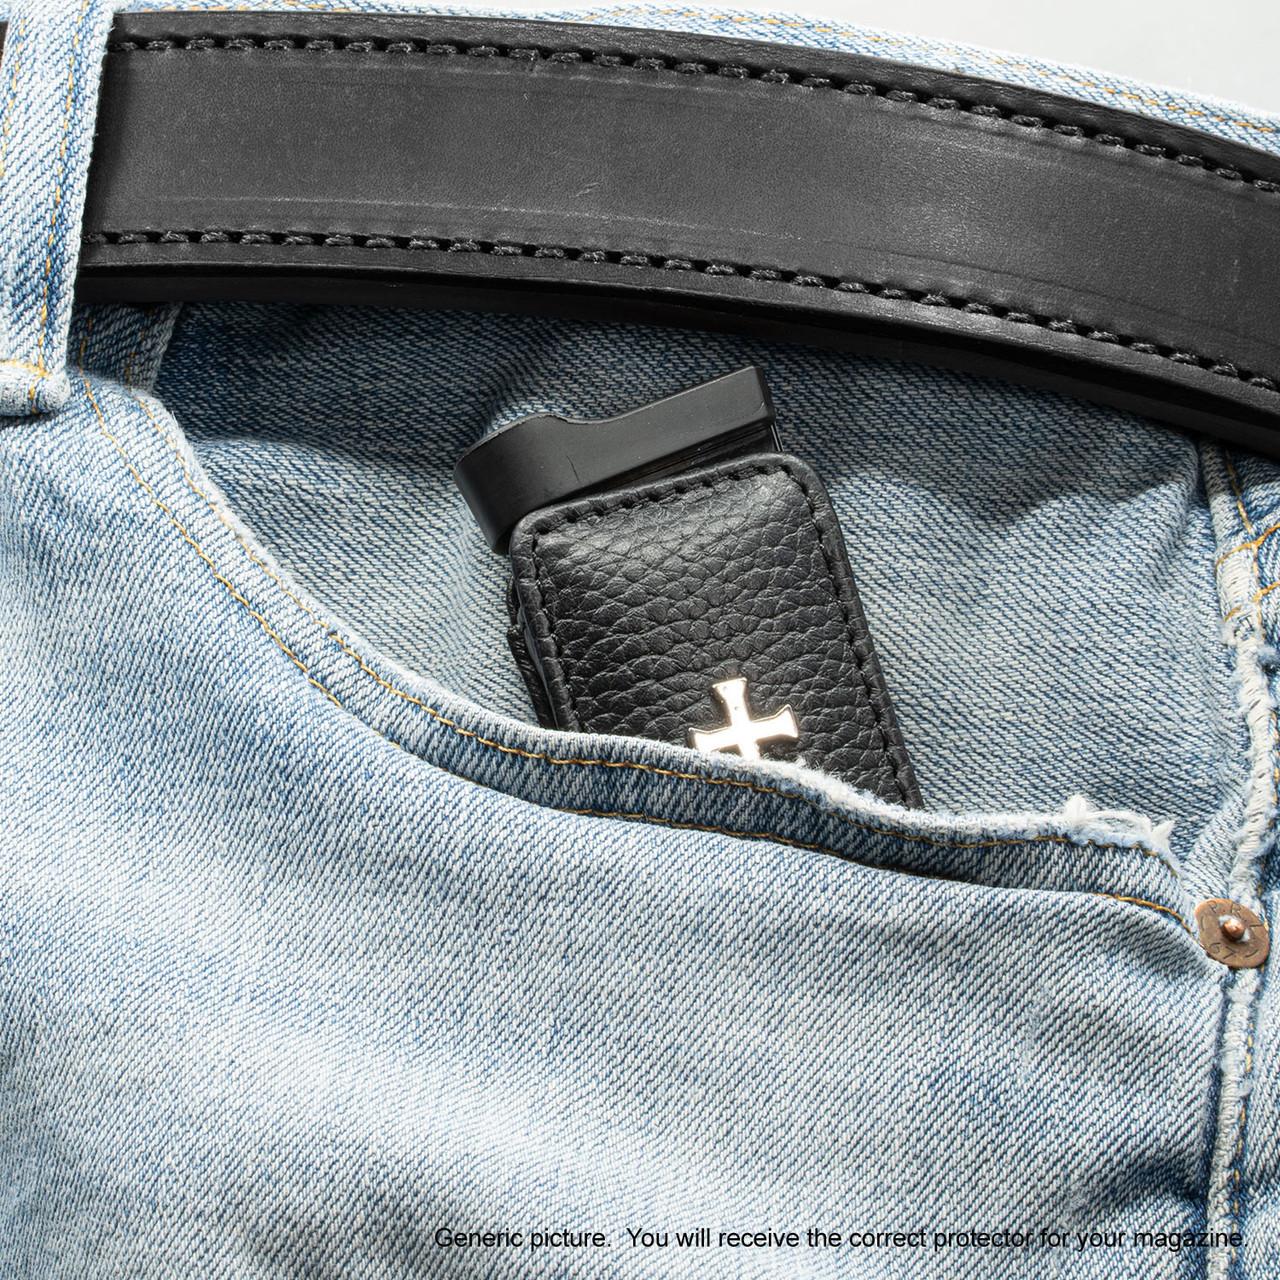 Mossberg MC2c Black Cross Magazine Pocket Protector